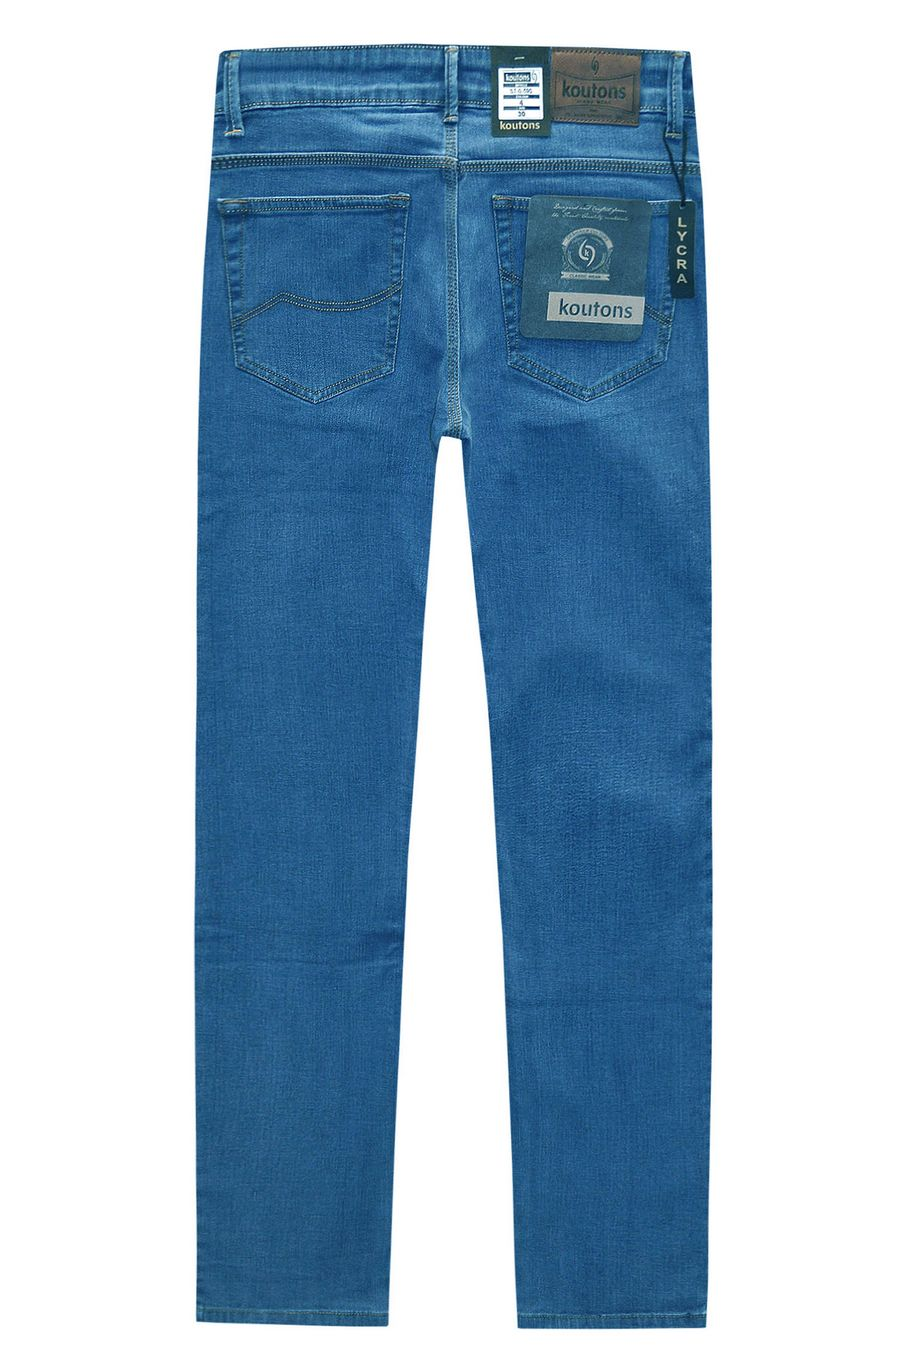 Джинсы мужские Koutons ST-0-590-4 Stretch Blue - фото 2